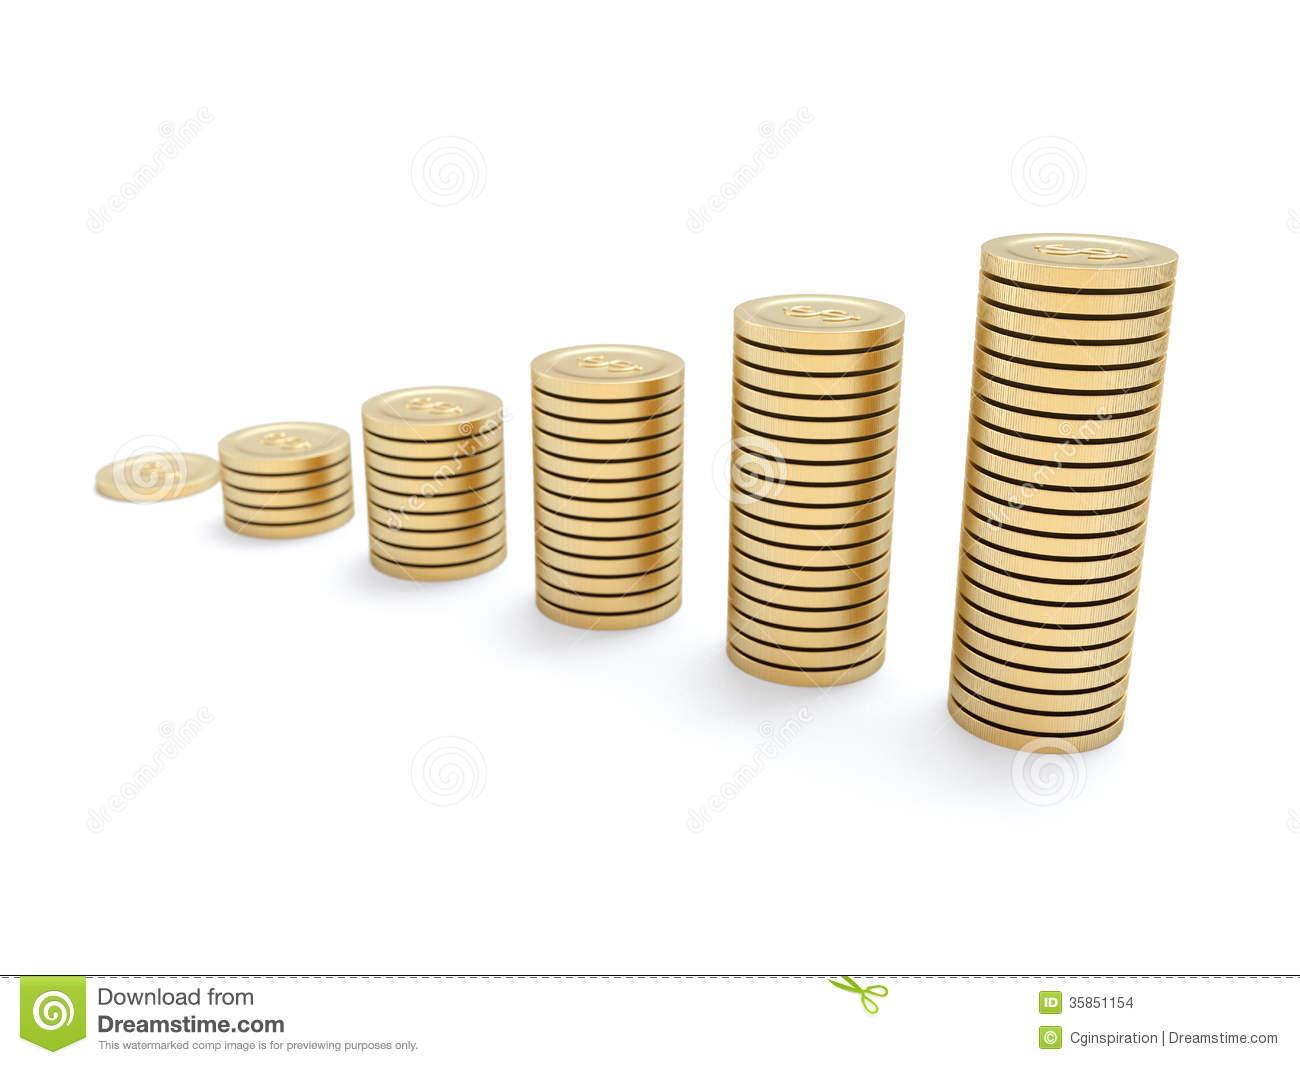 Building bitcoin-like digital currency